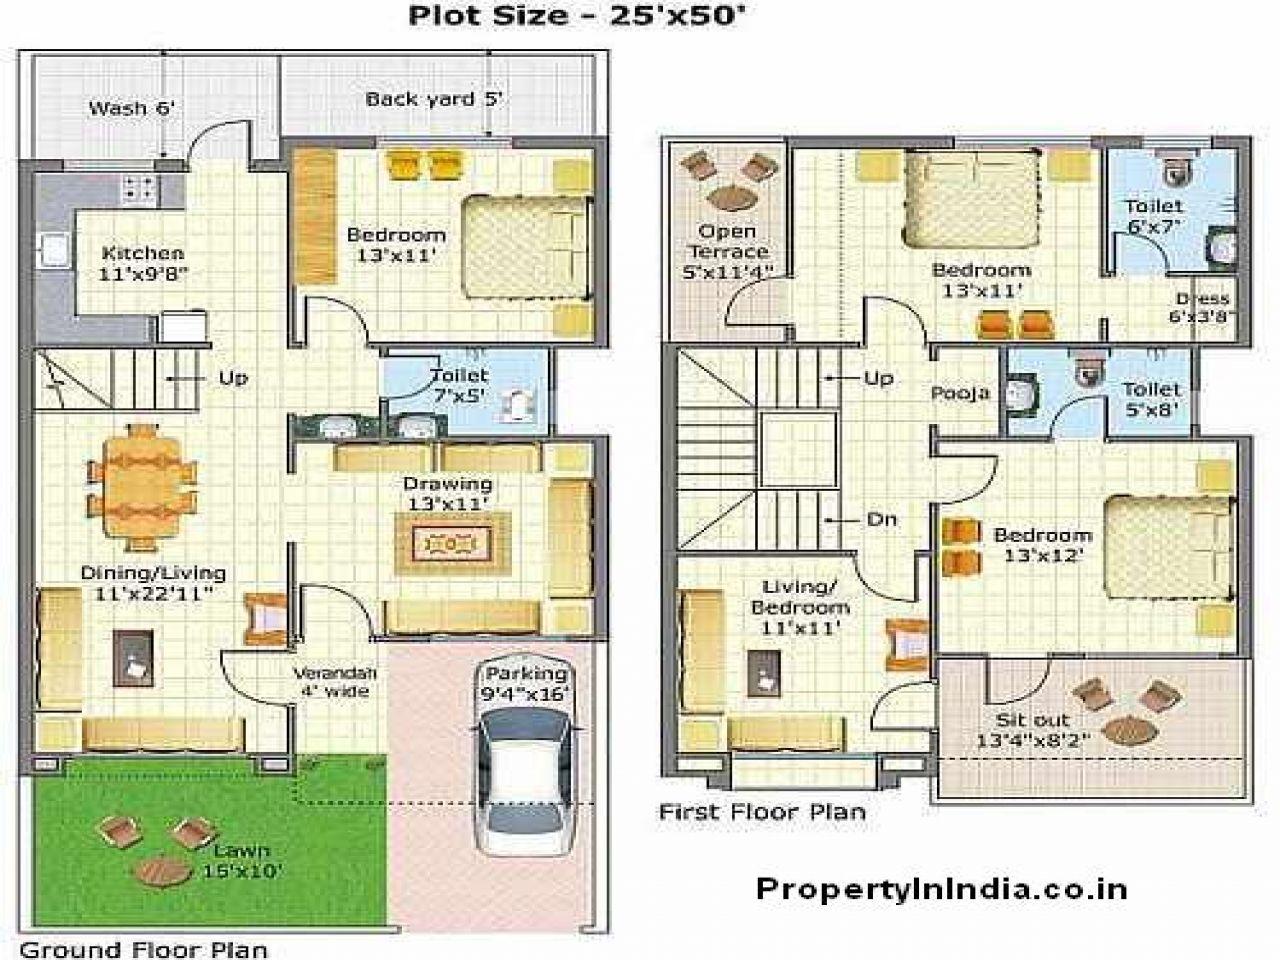 Bungalow Floor Plans Free Indian House Plans Duplex House Design Duplex House Plans